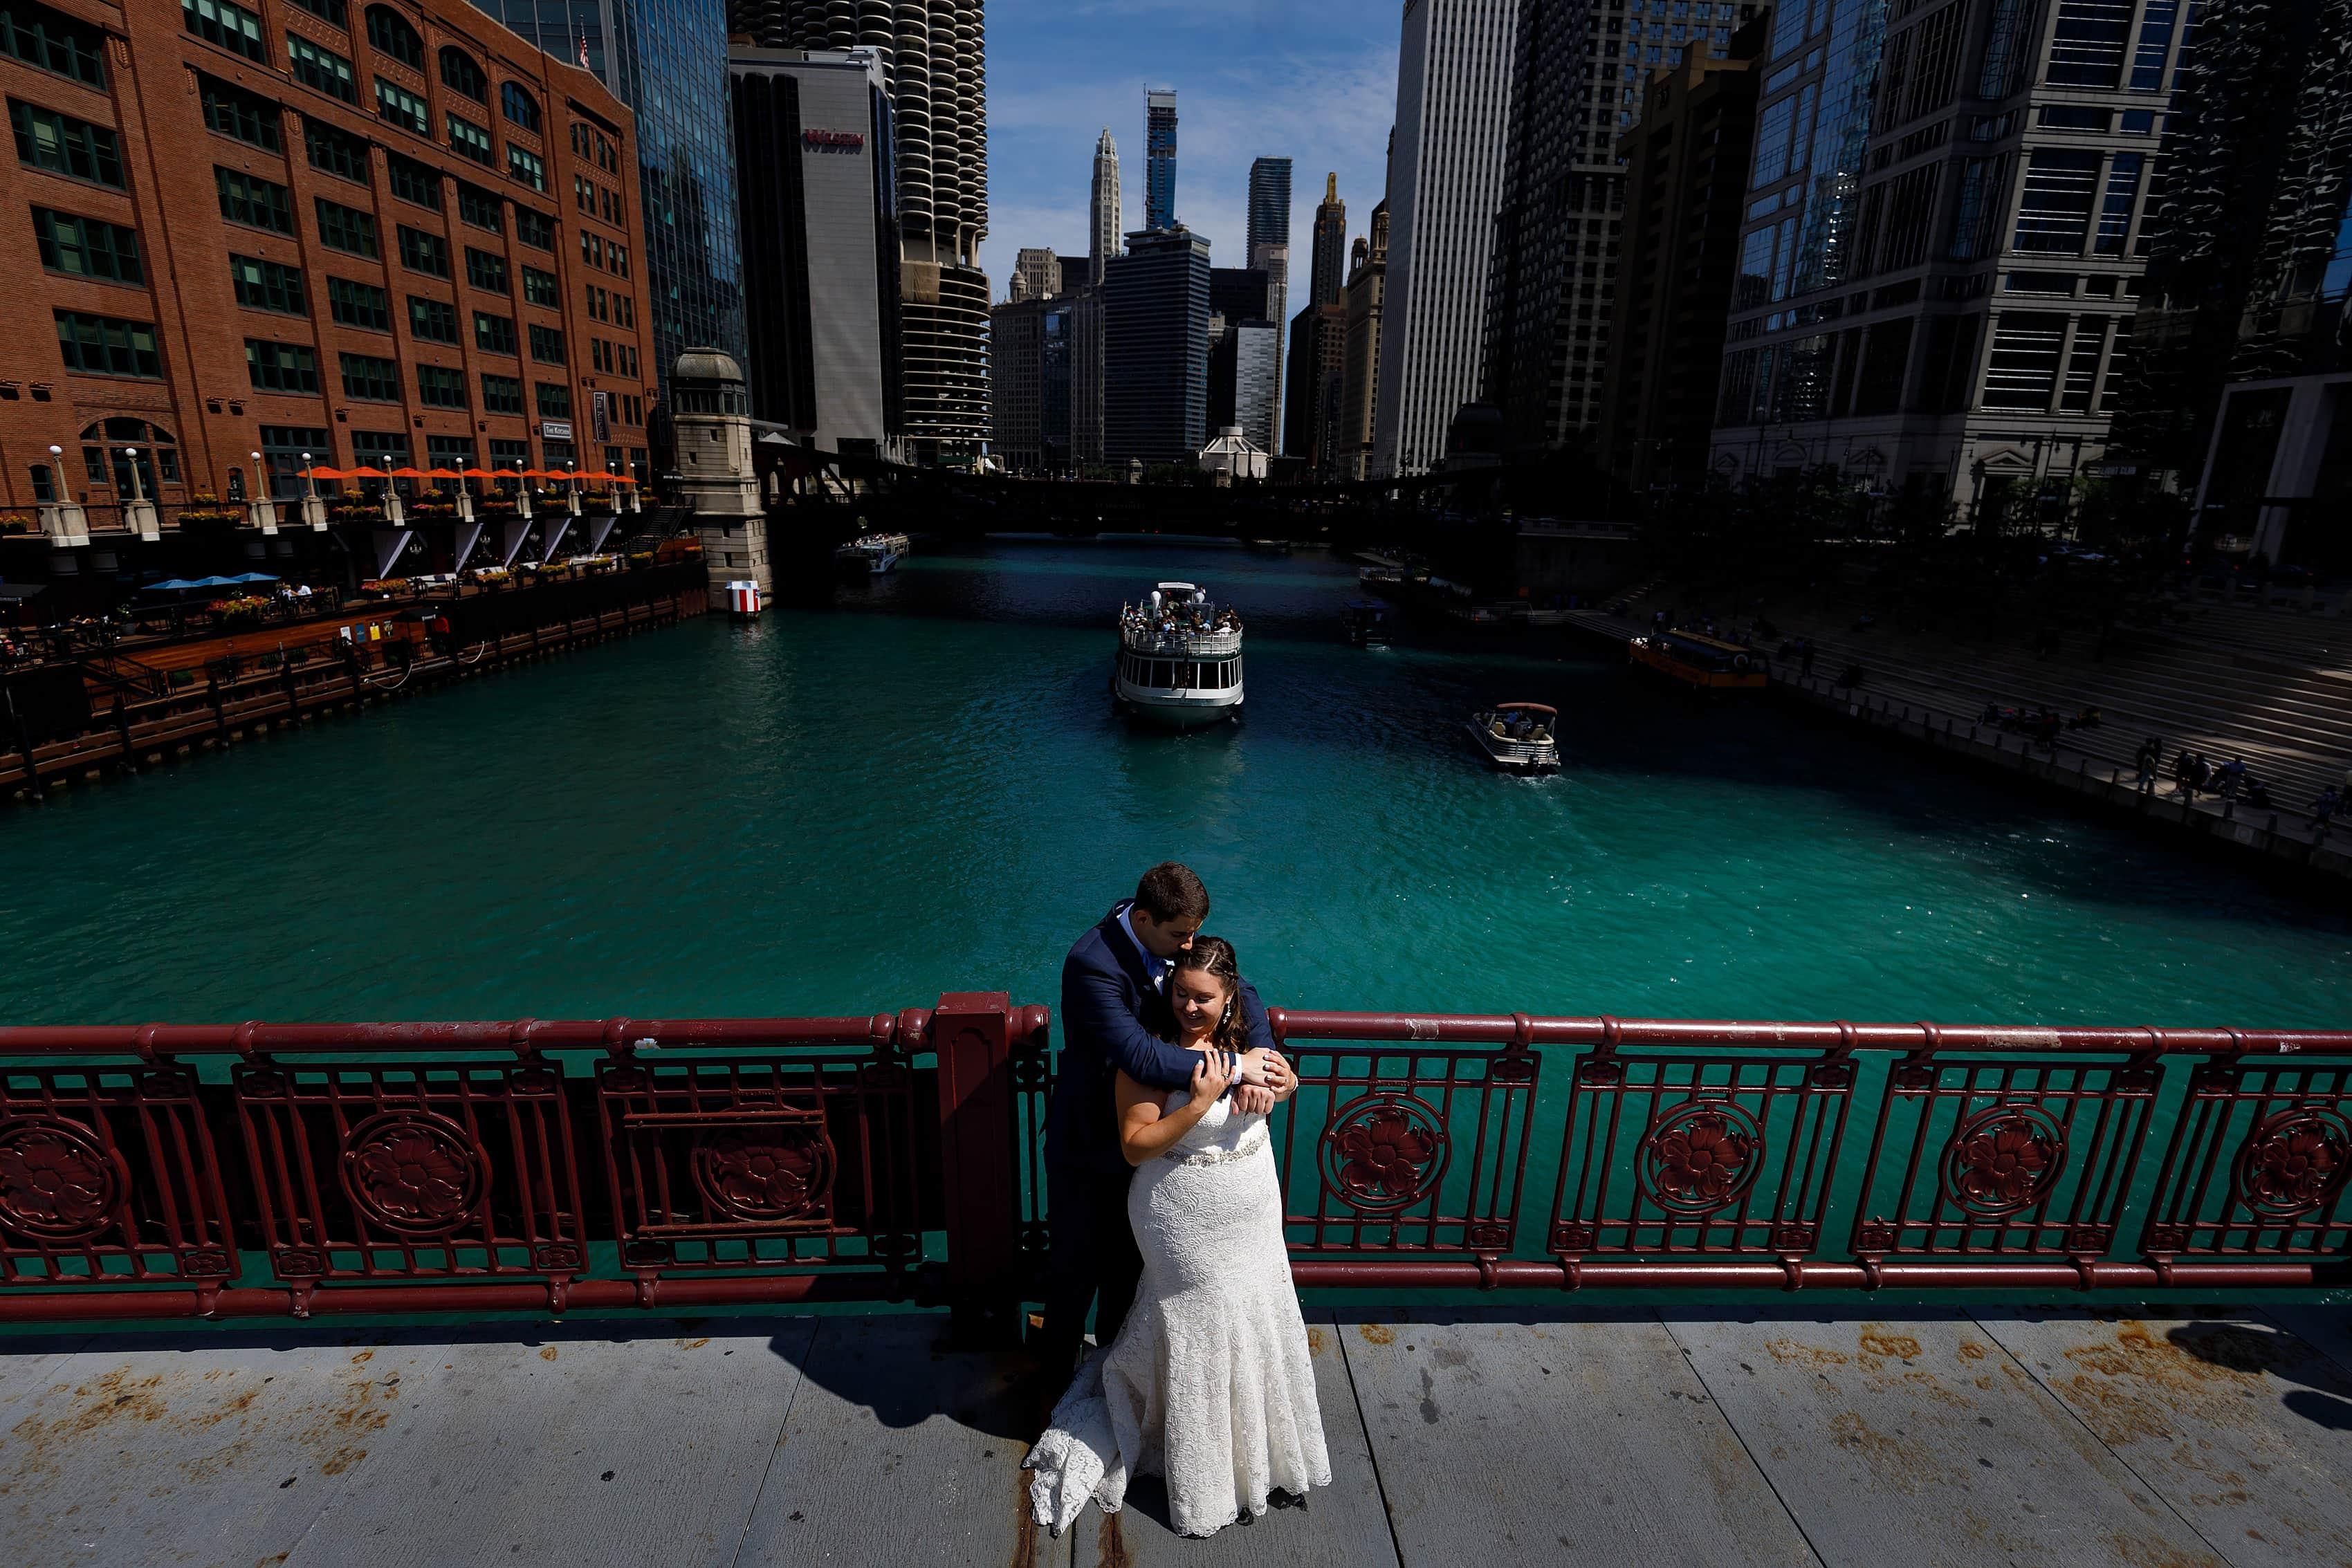 bride and groom portrait on LaSalle street bridge in downtown Chicago